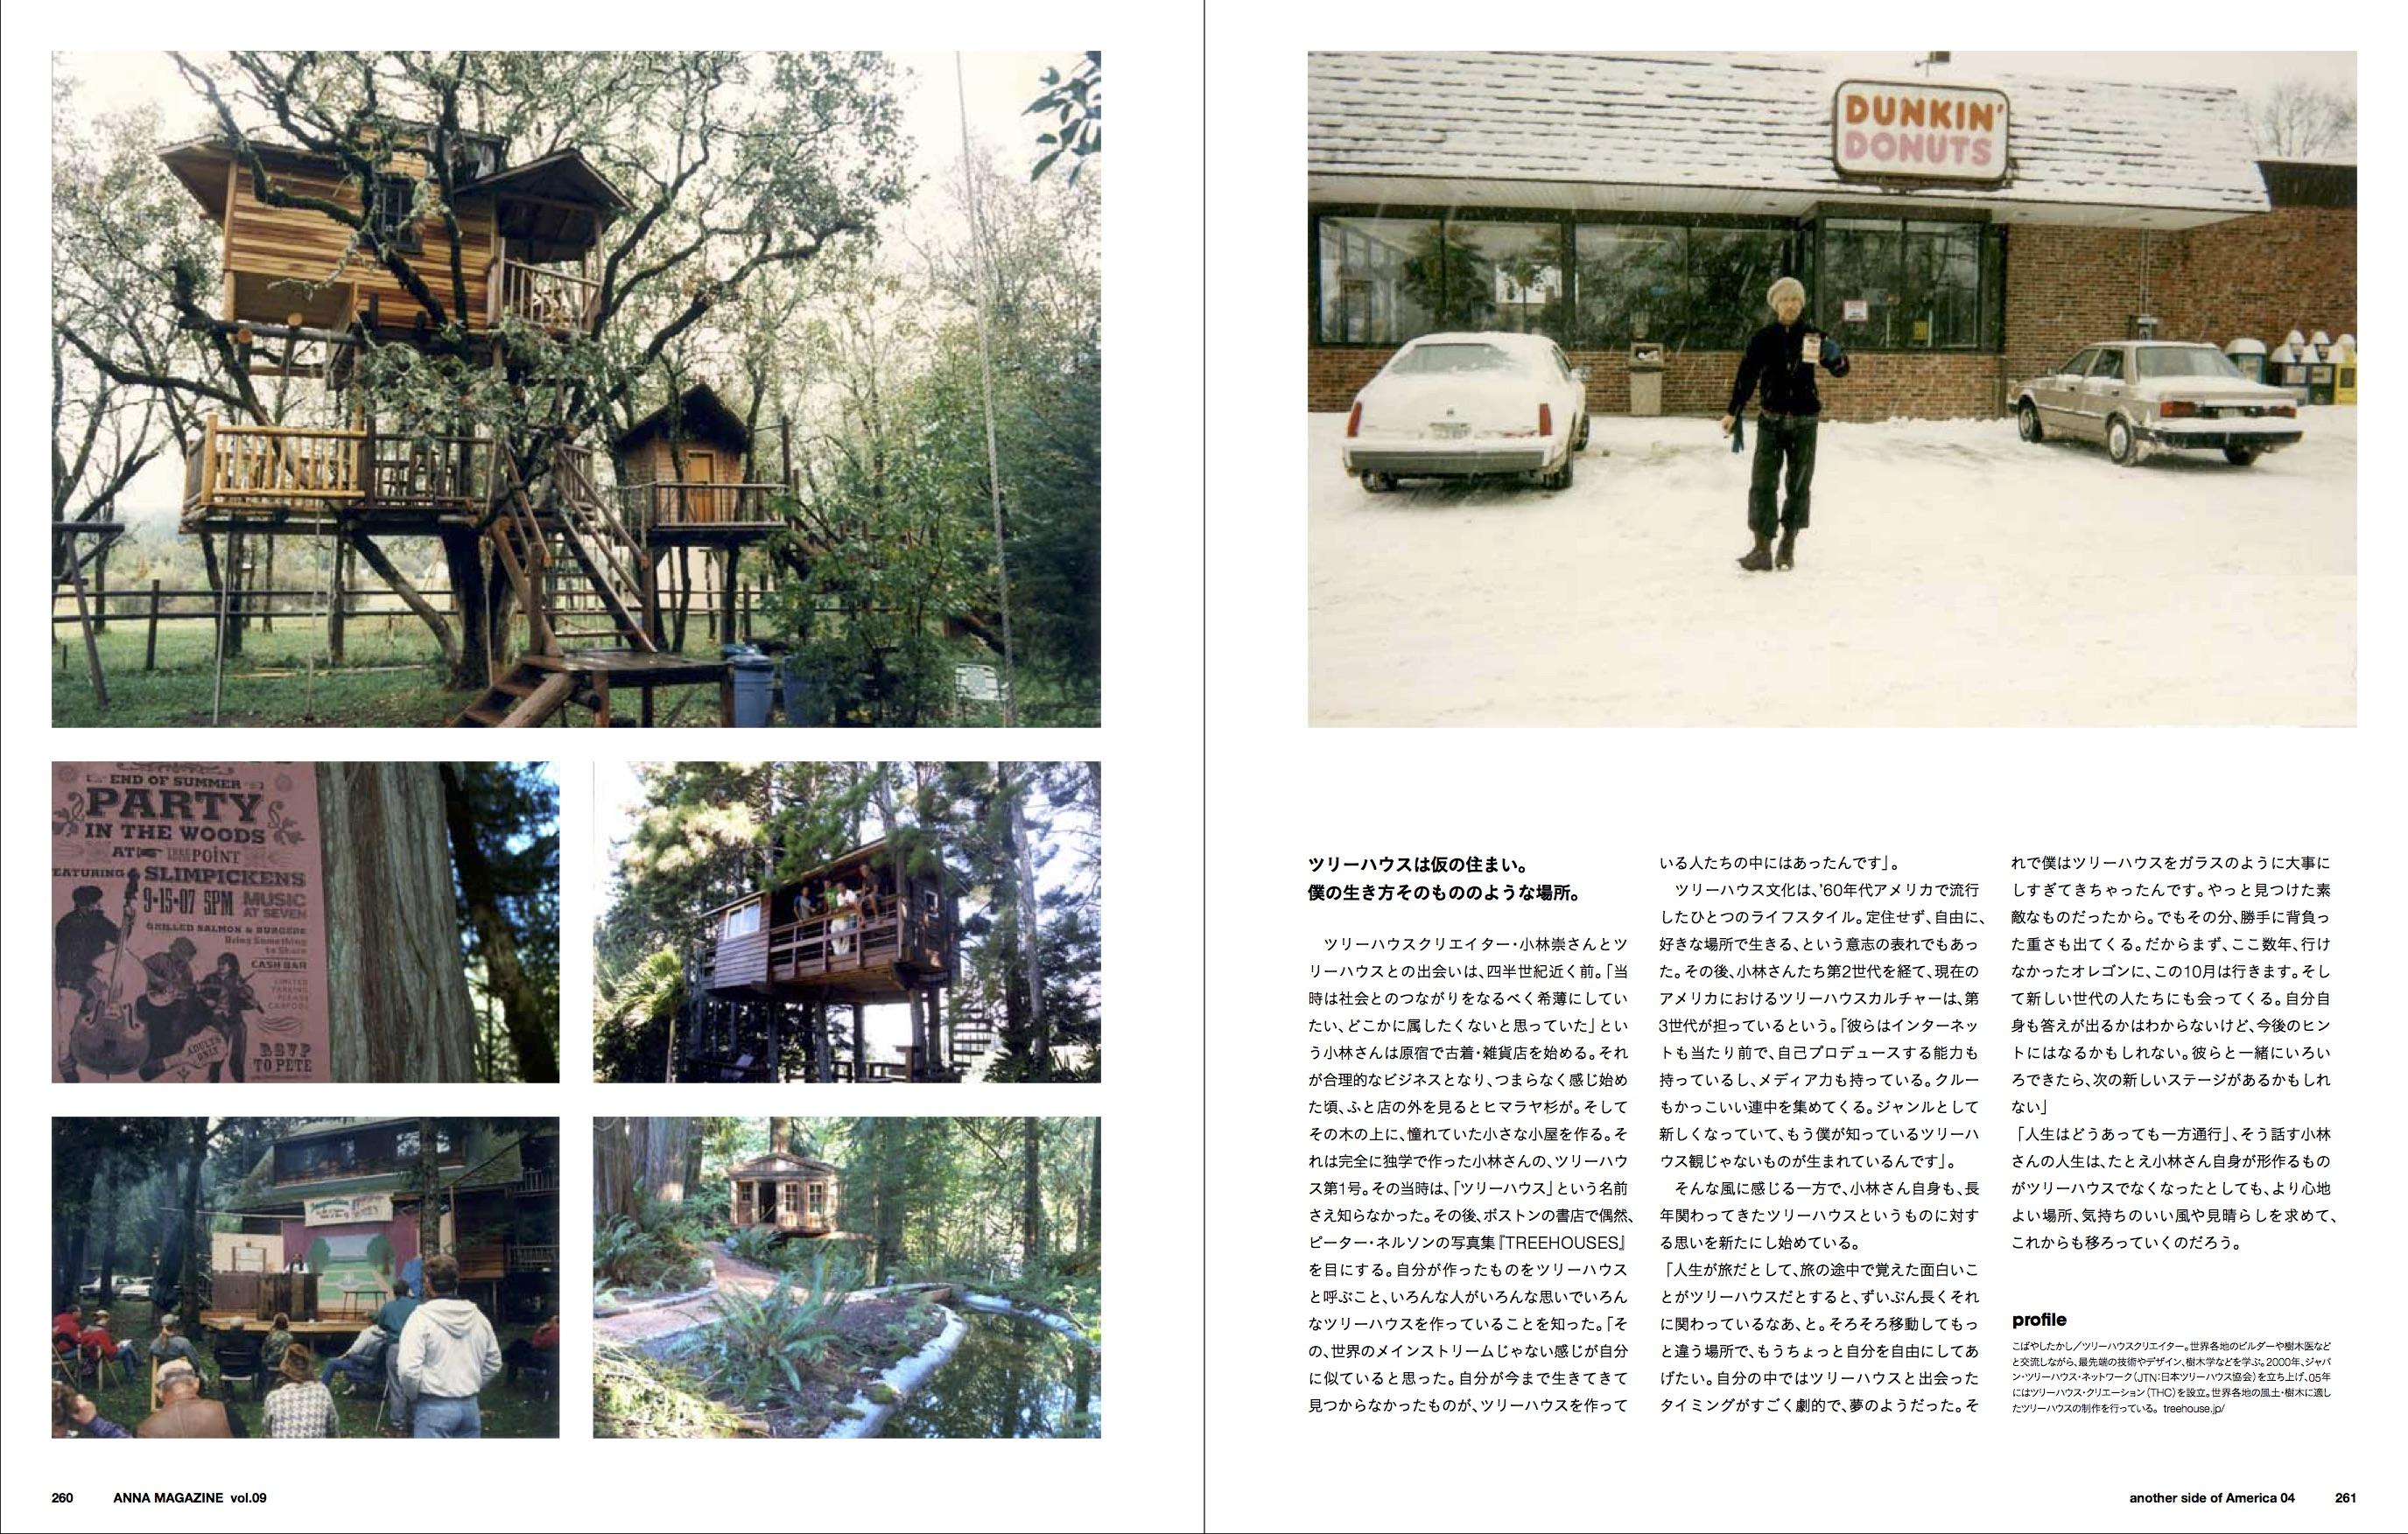 anna magazine vol.9 P123